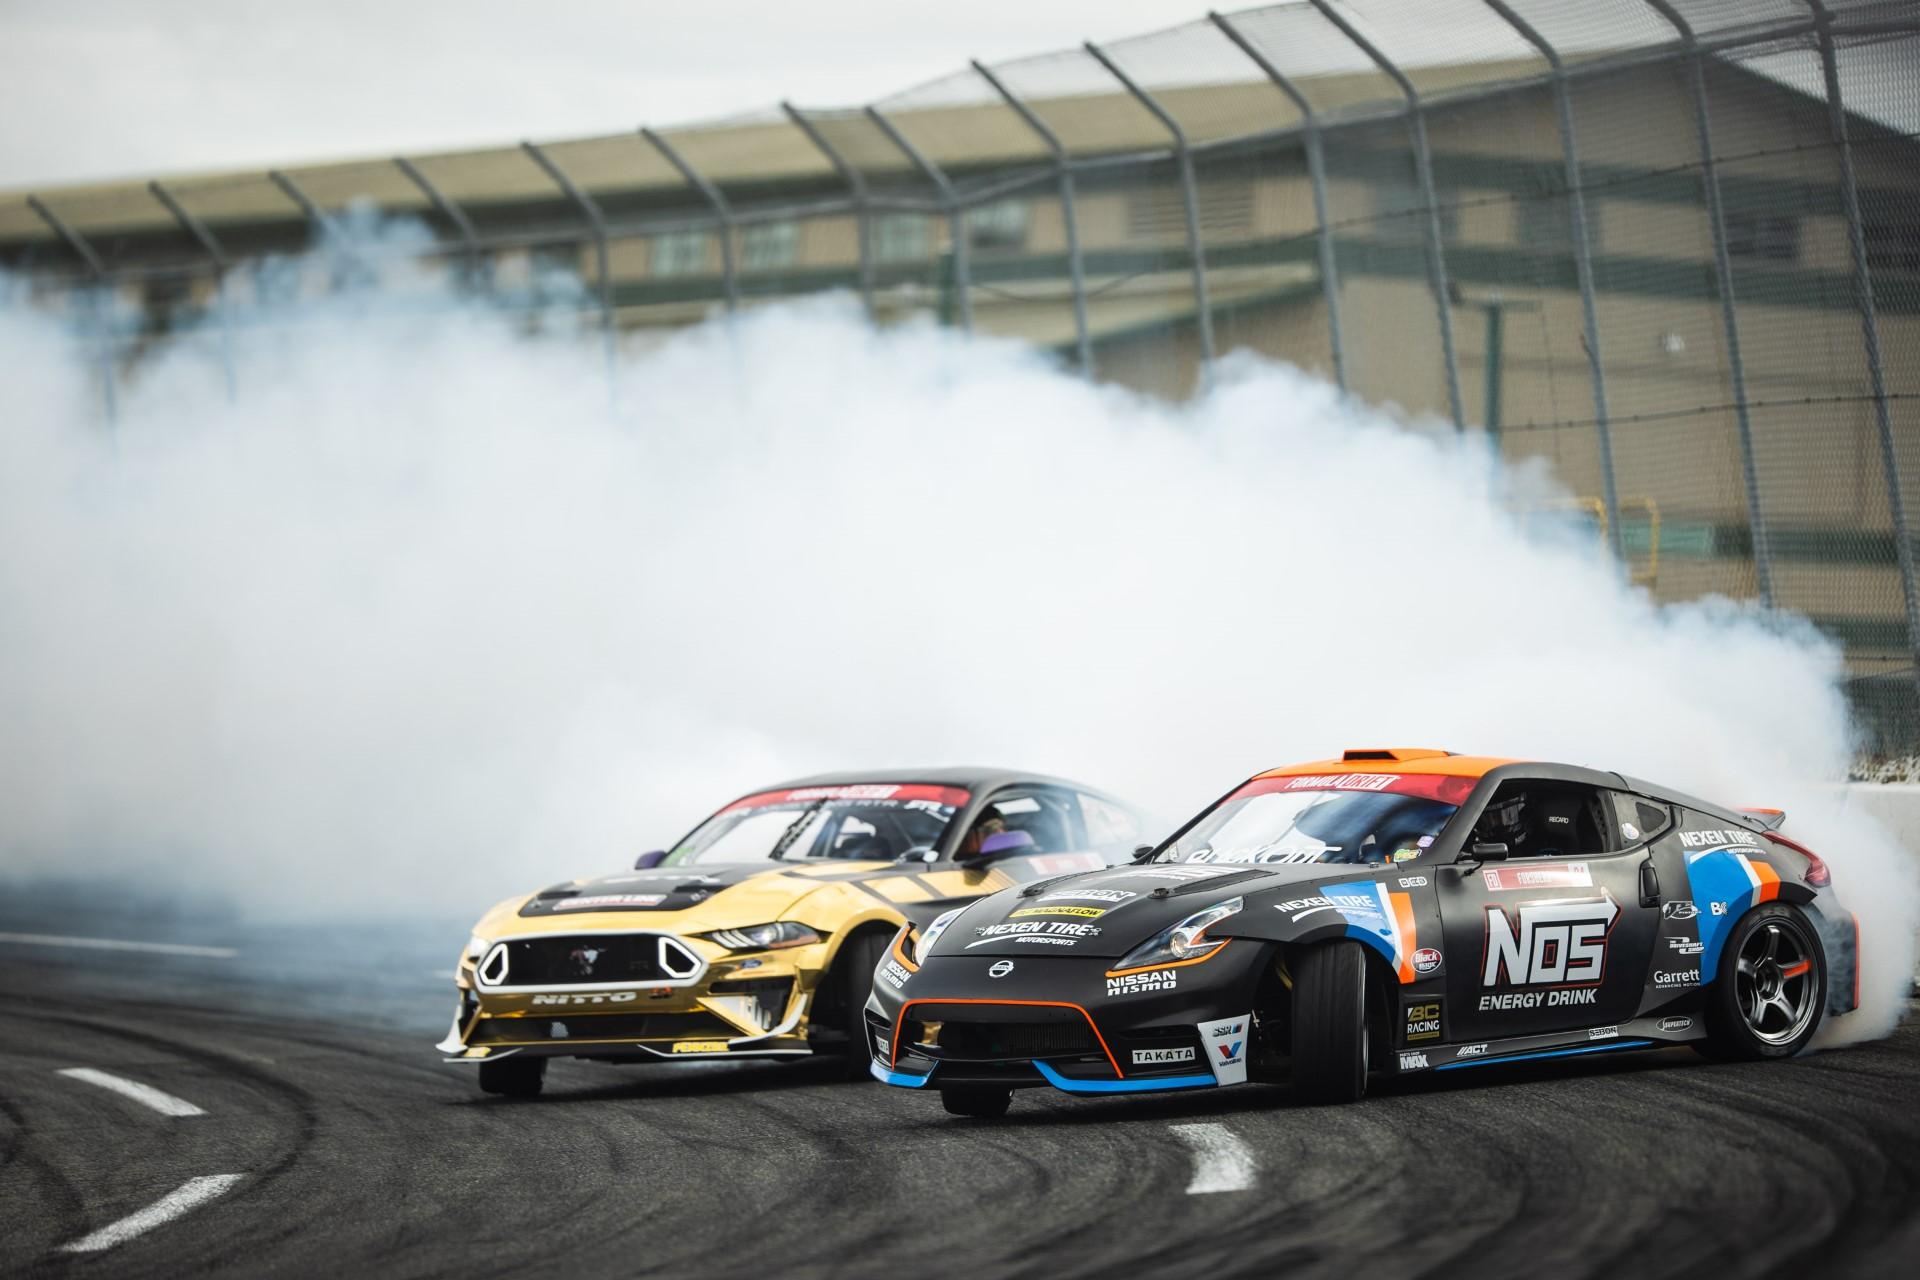 bc-racing-na-chris-forsberg-9189